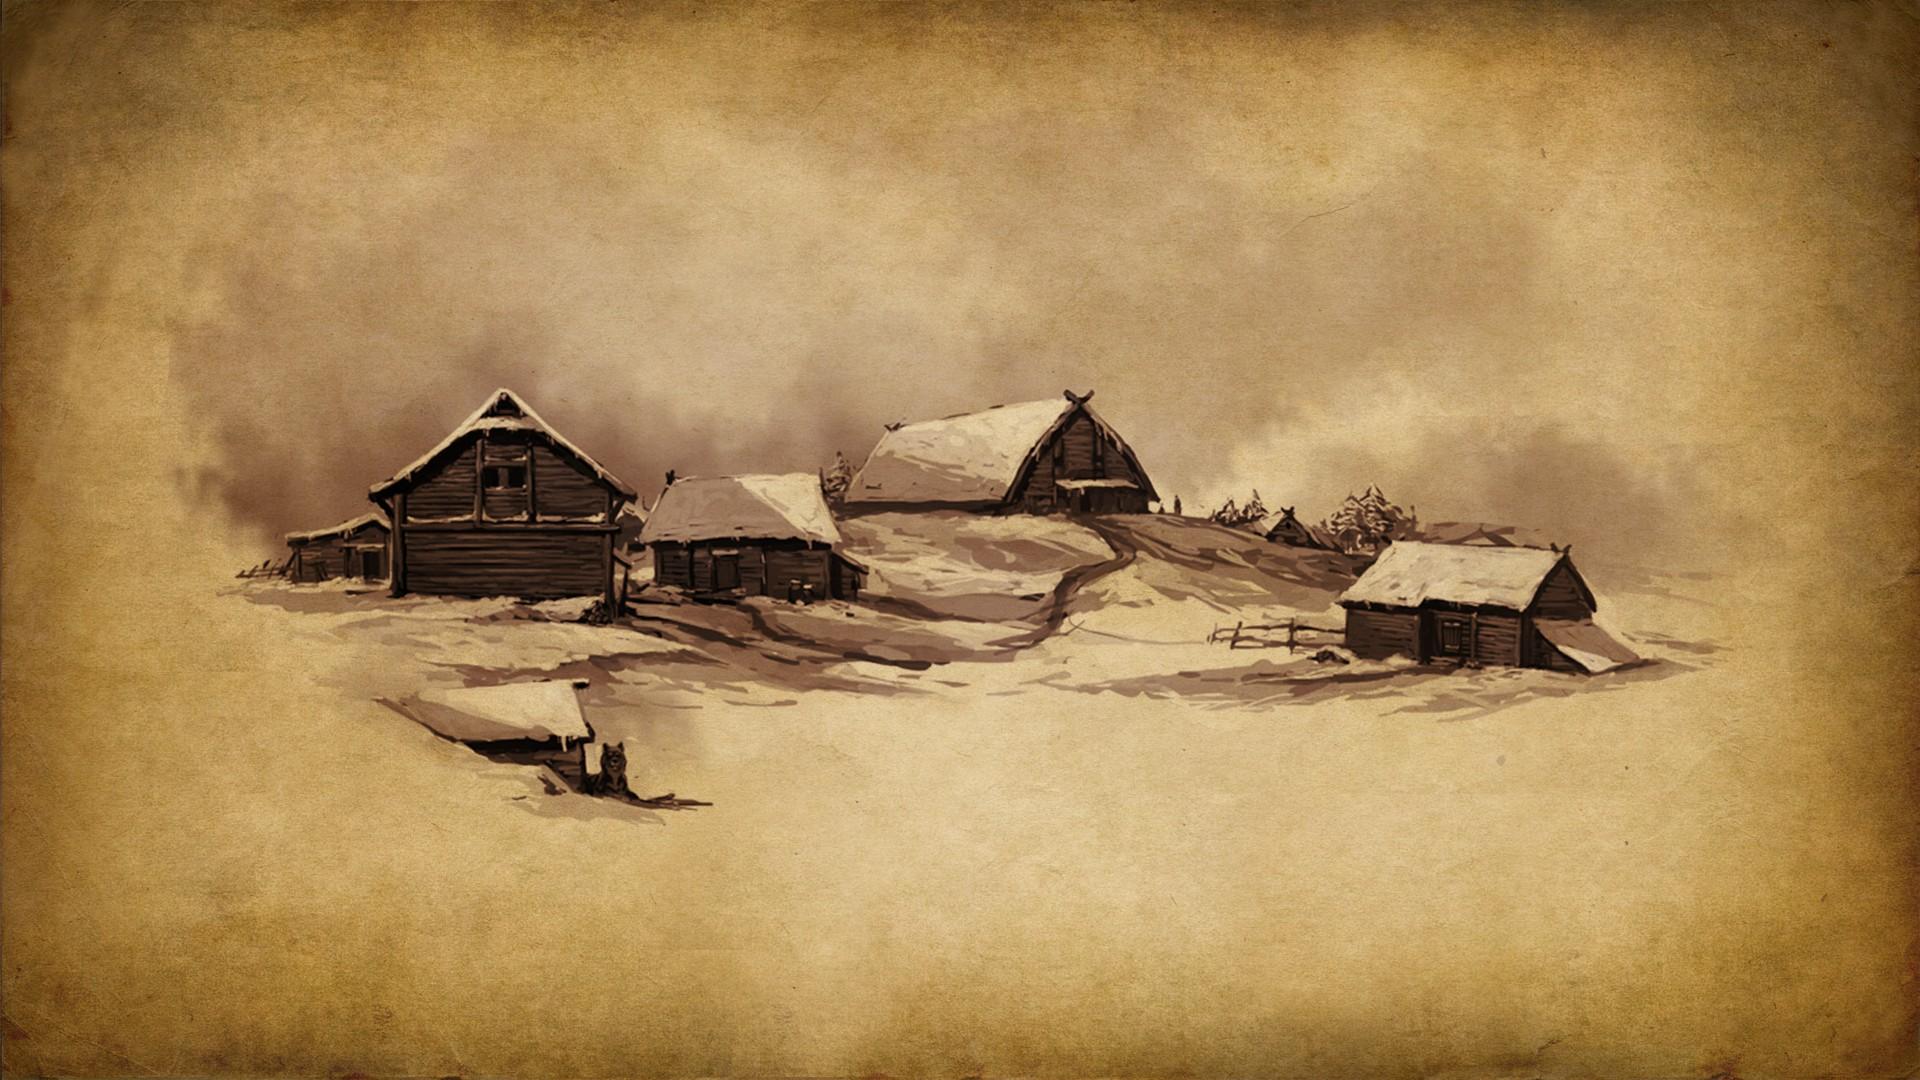 Wallpaper Gambar Lukisan Seni Fantasi Tekstur Gunung